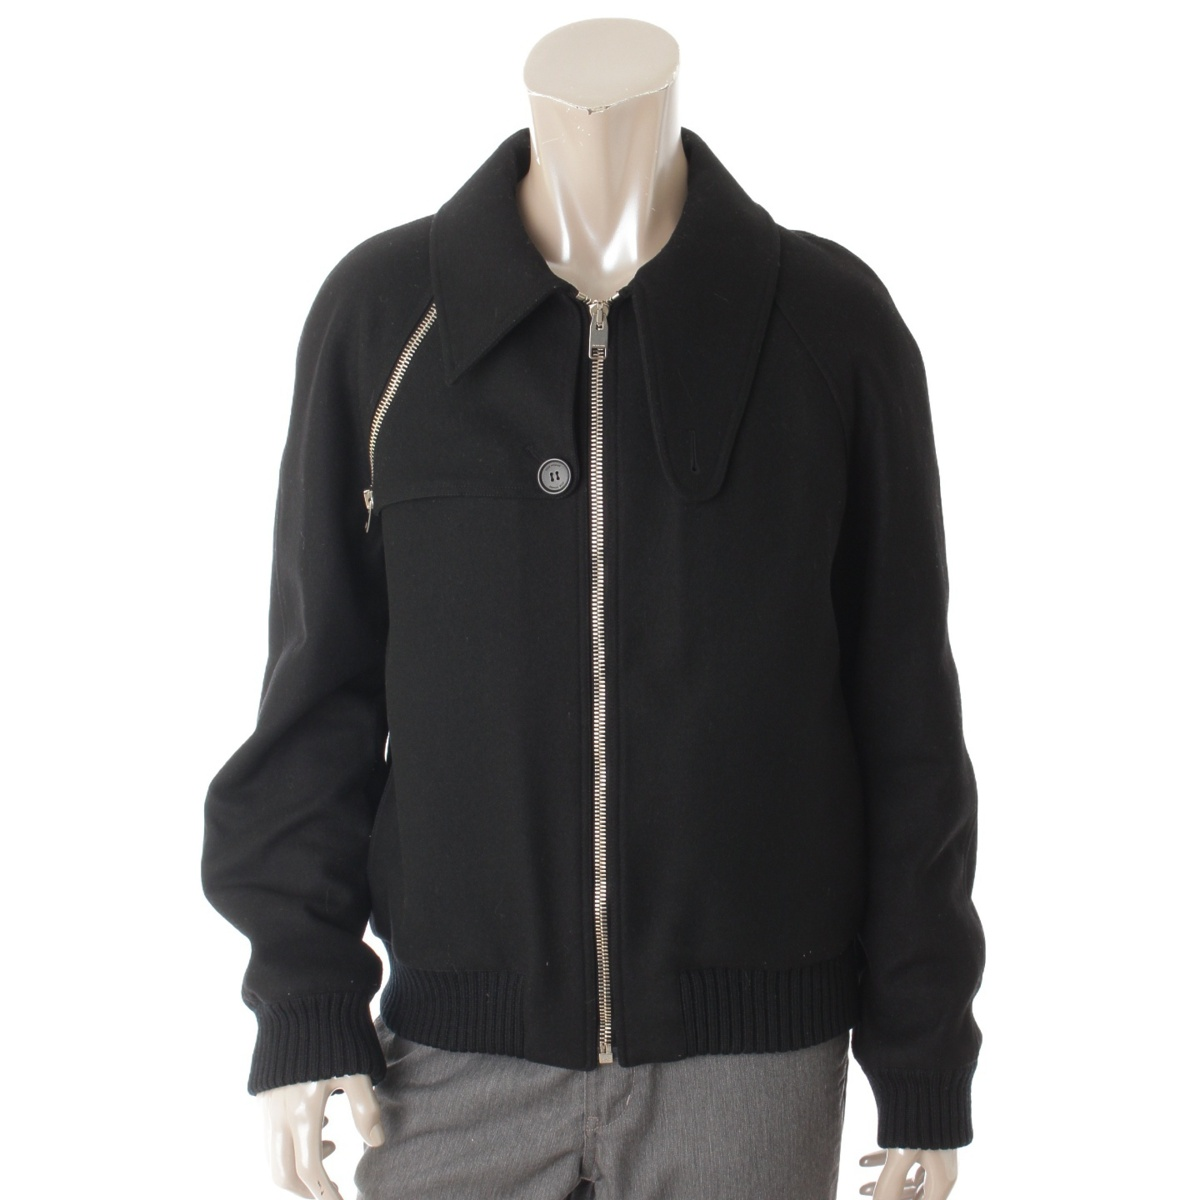 【30%OFFセール】【ディオールオム】Dior Homme メンズ ウール ブルゾン ジャケット ブラック 48 【中古】【鑑定済・正規品保証】68909